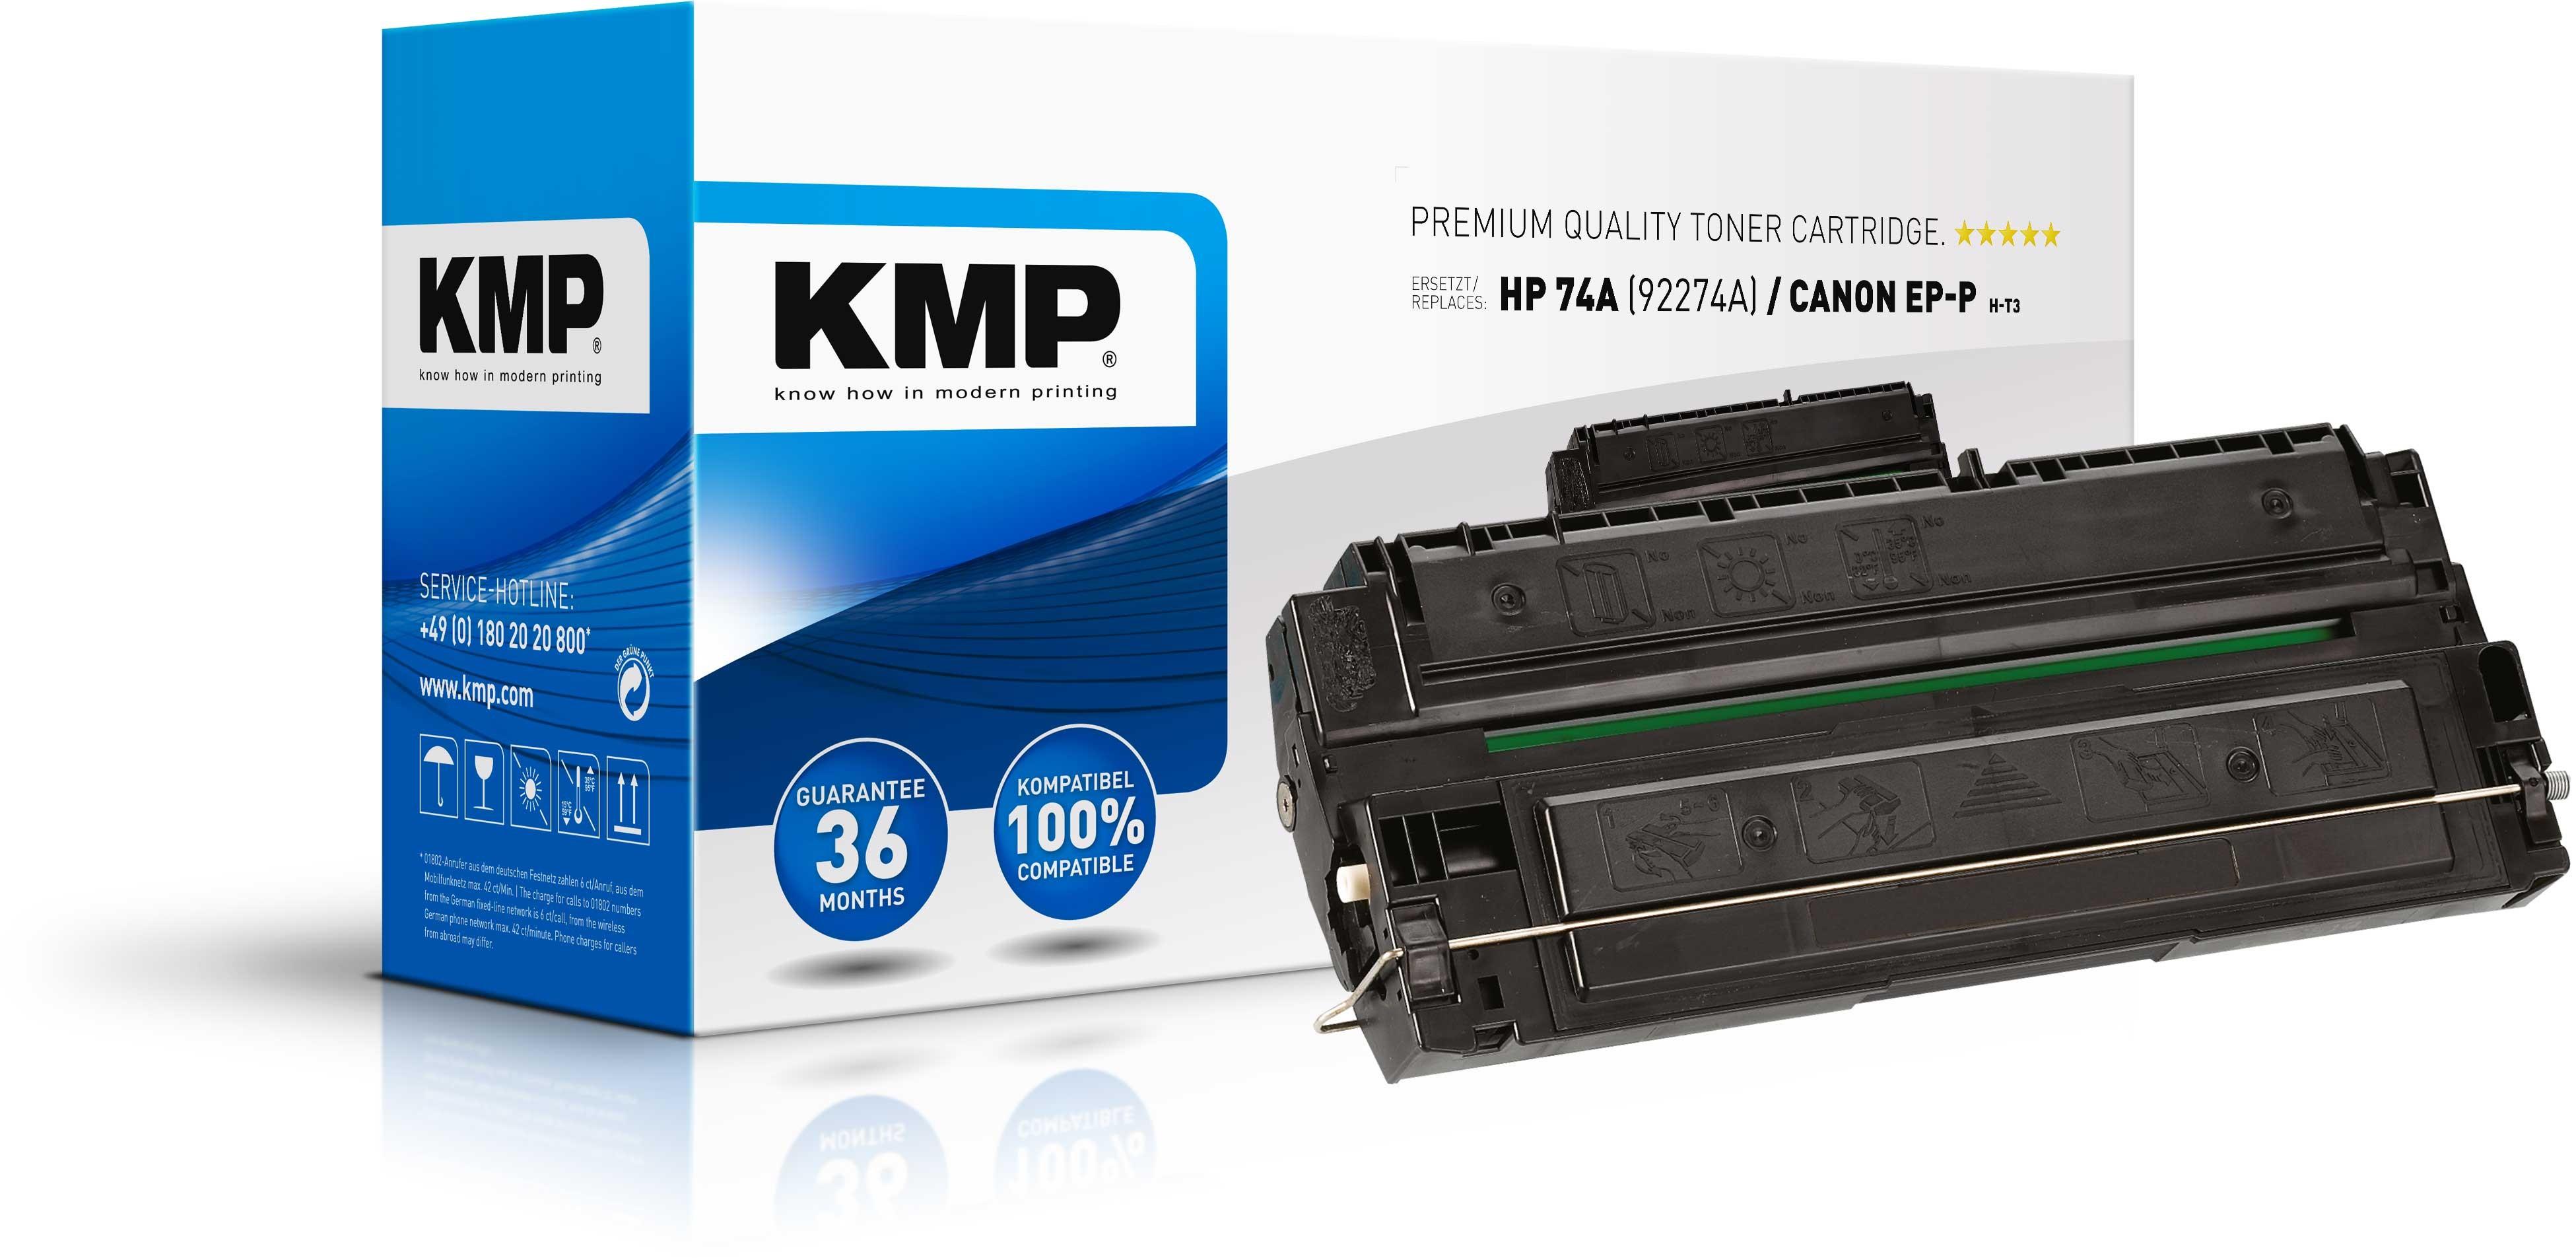 Vorschau: KMP Toner für HP 92274A Laserjet 4L / 4ML / 4MP / 4P High Yield